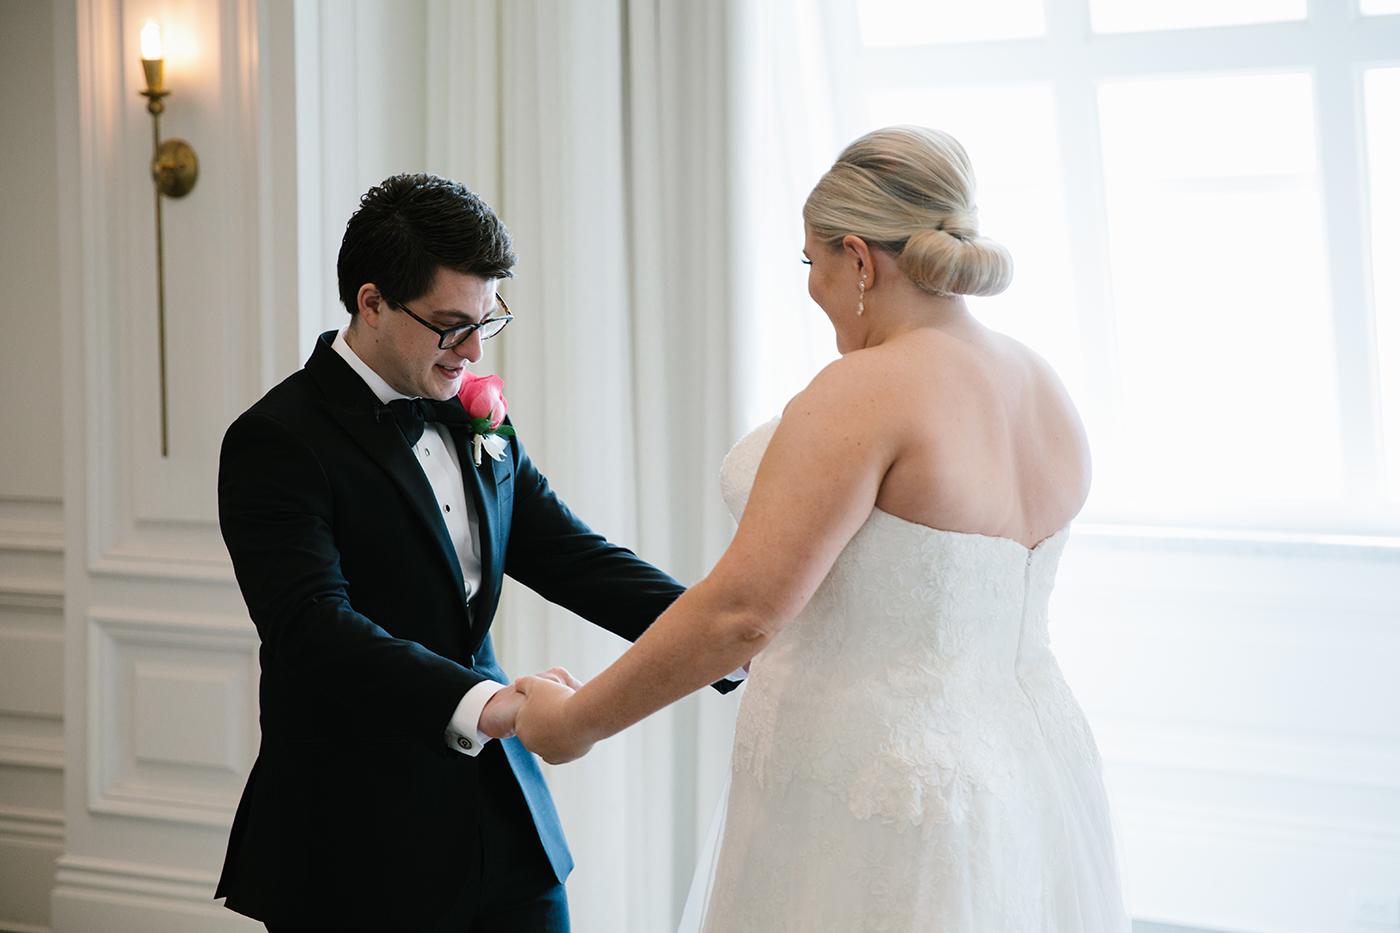 Dallas Weddings Planner - Allday Events - Katie + Matthew at The Adolphus Hotel - 157.jpg